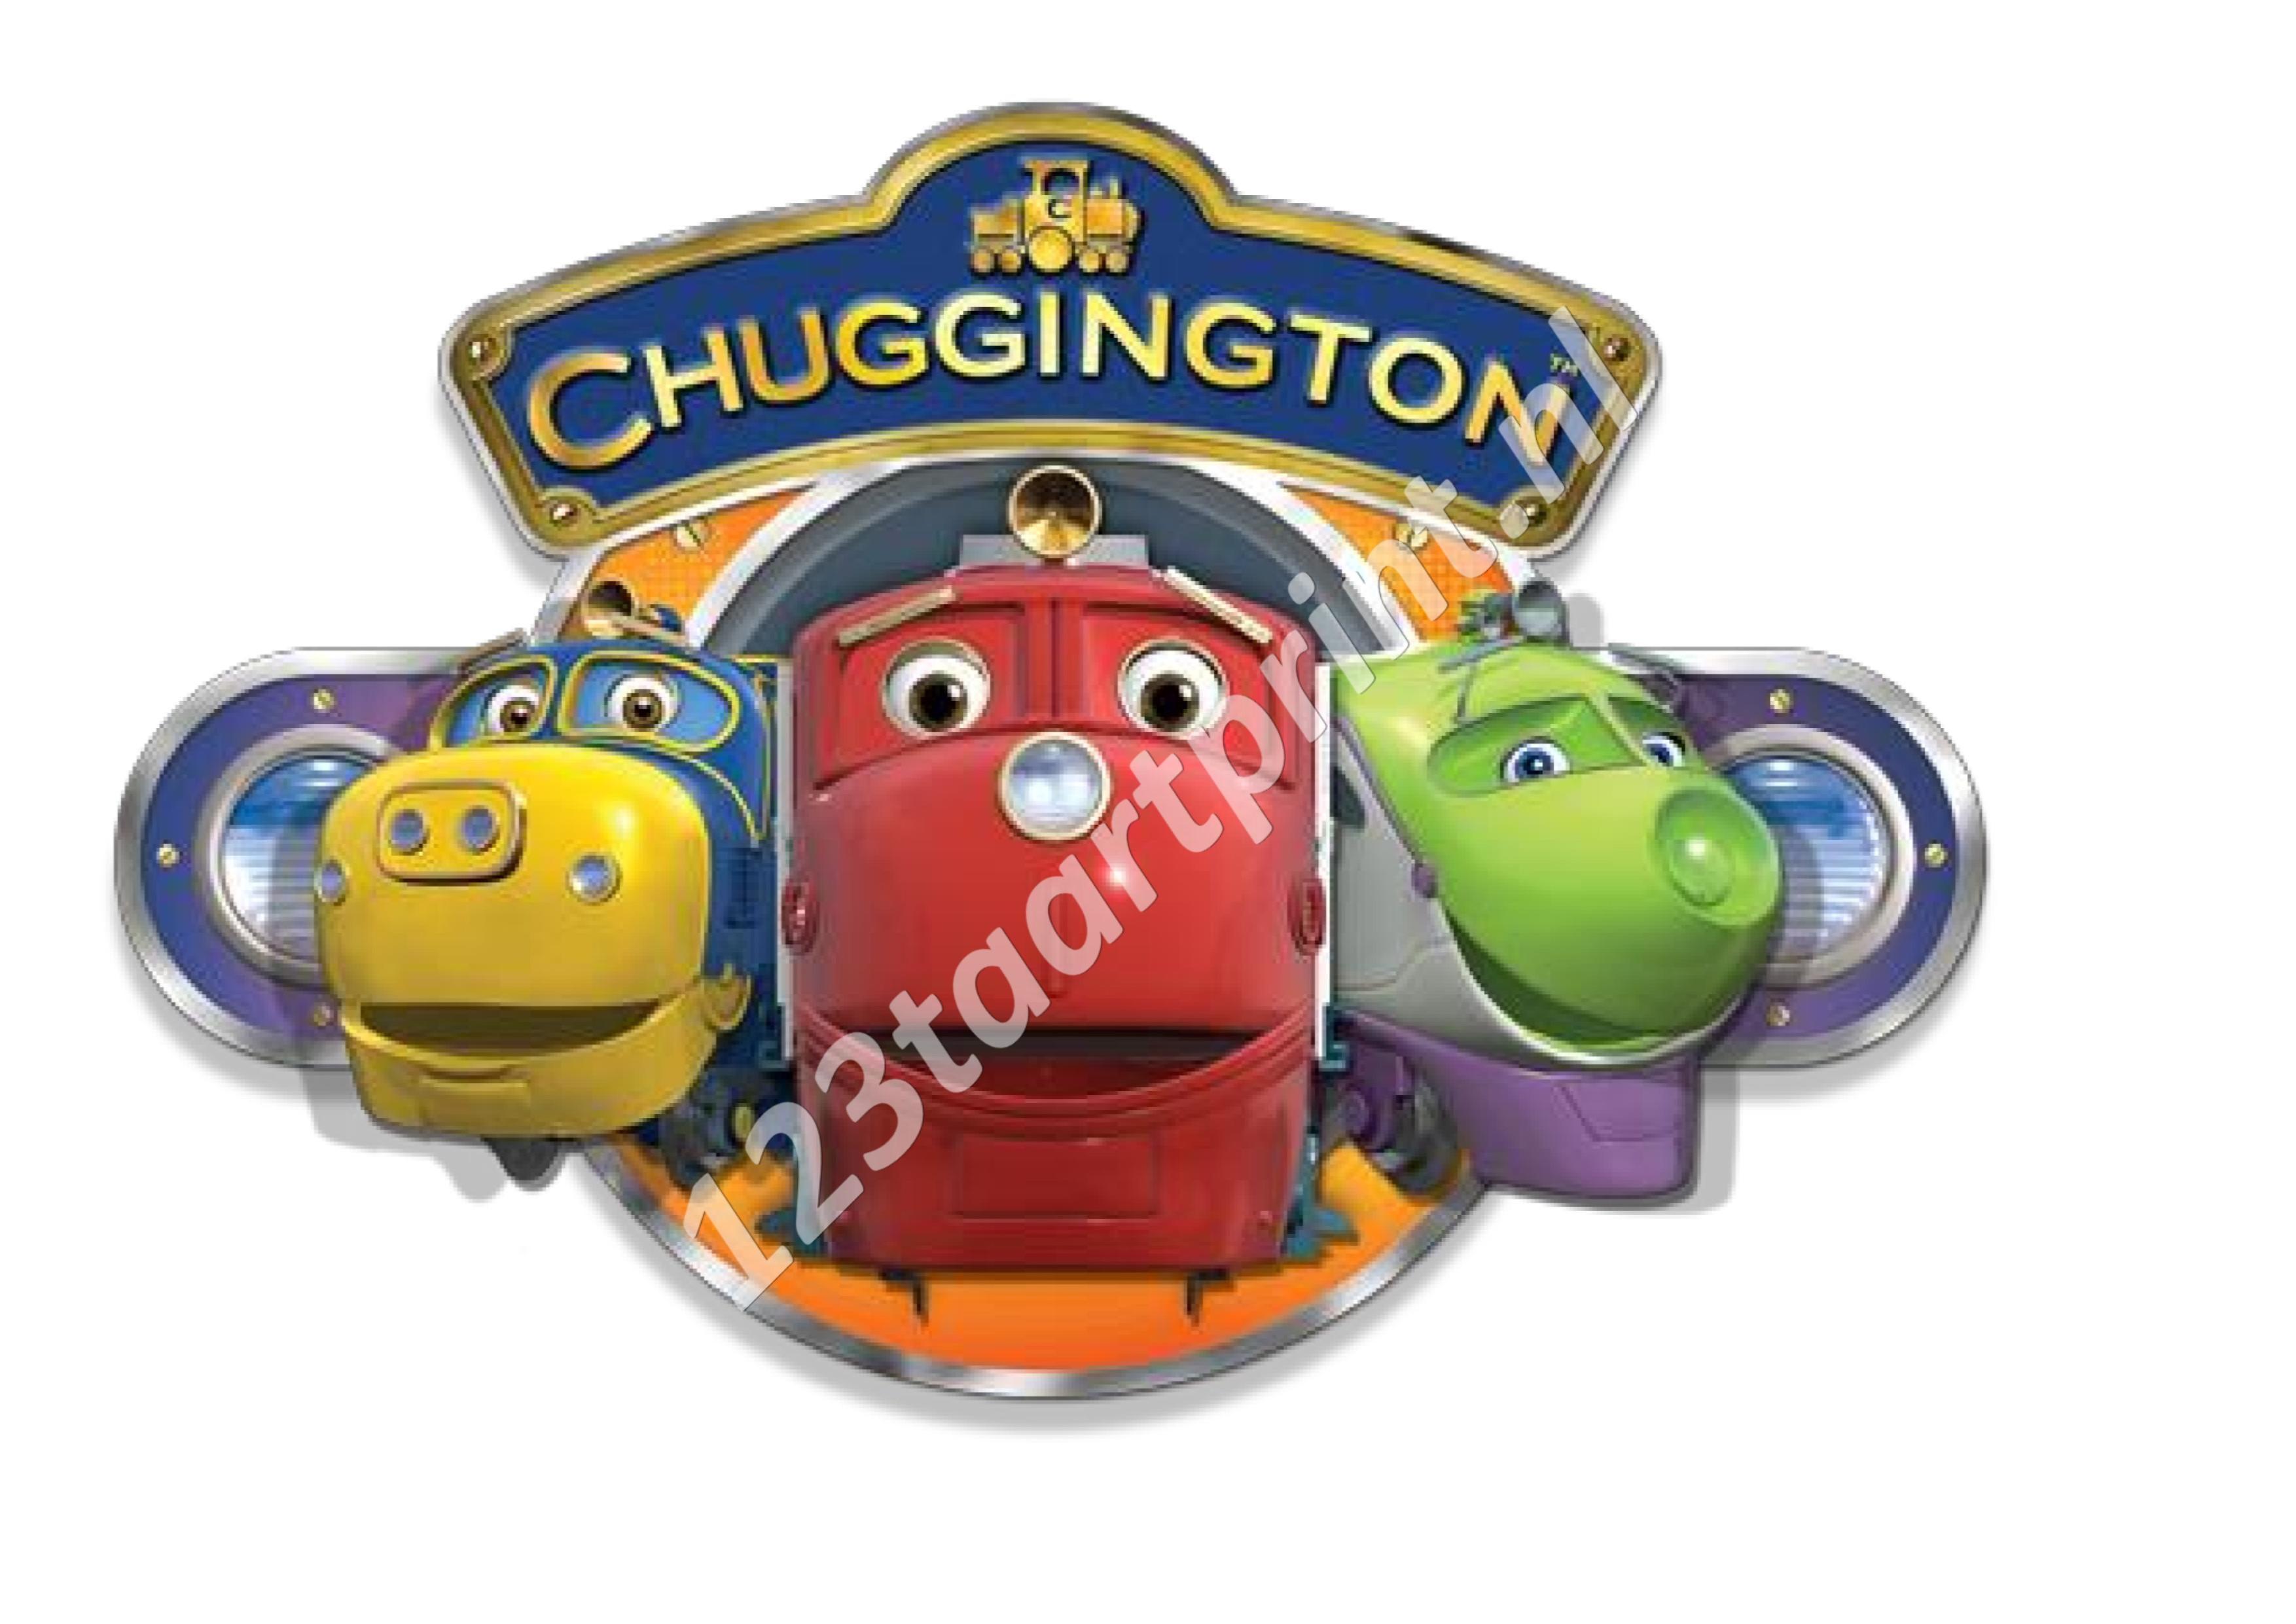 Chunnington 3